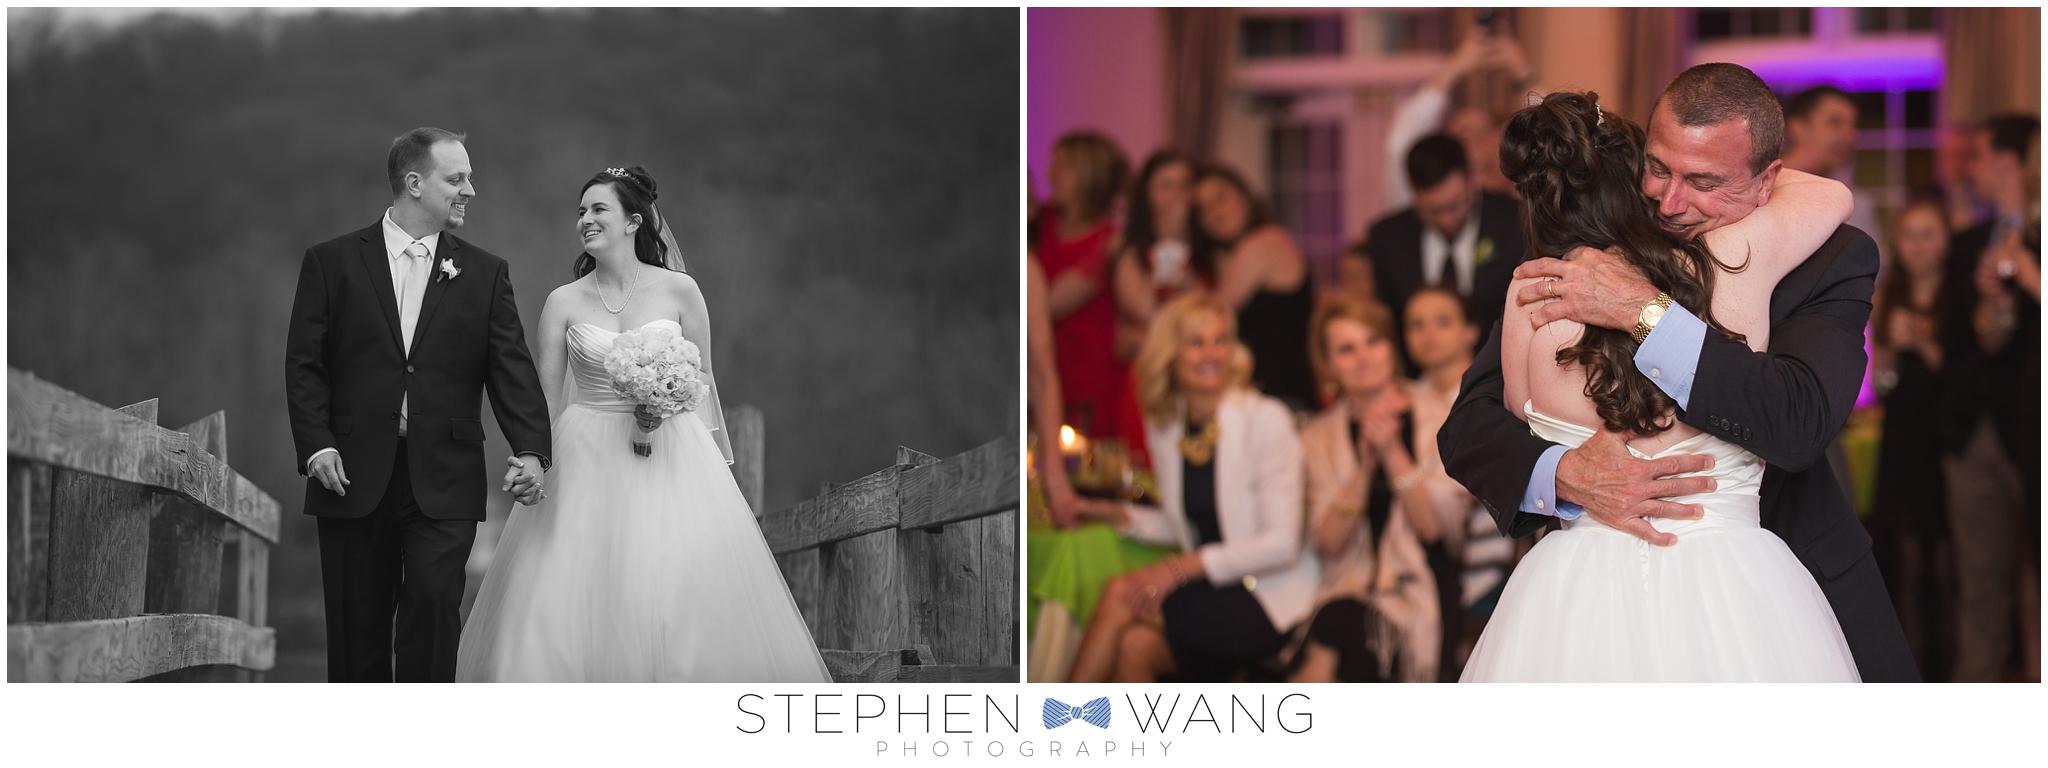 Stephen Wang Photography Wedding Photographer Connecticut CT-12-24_0009.jpg